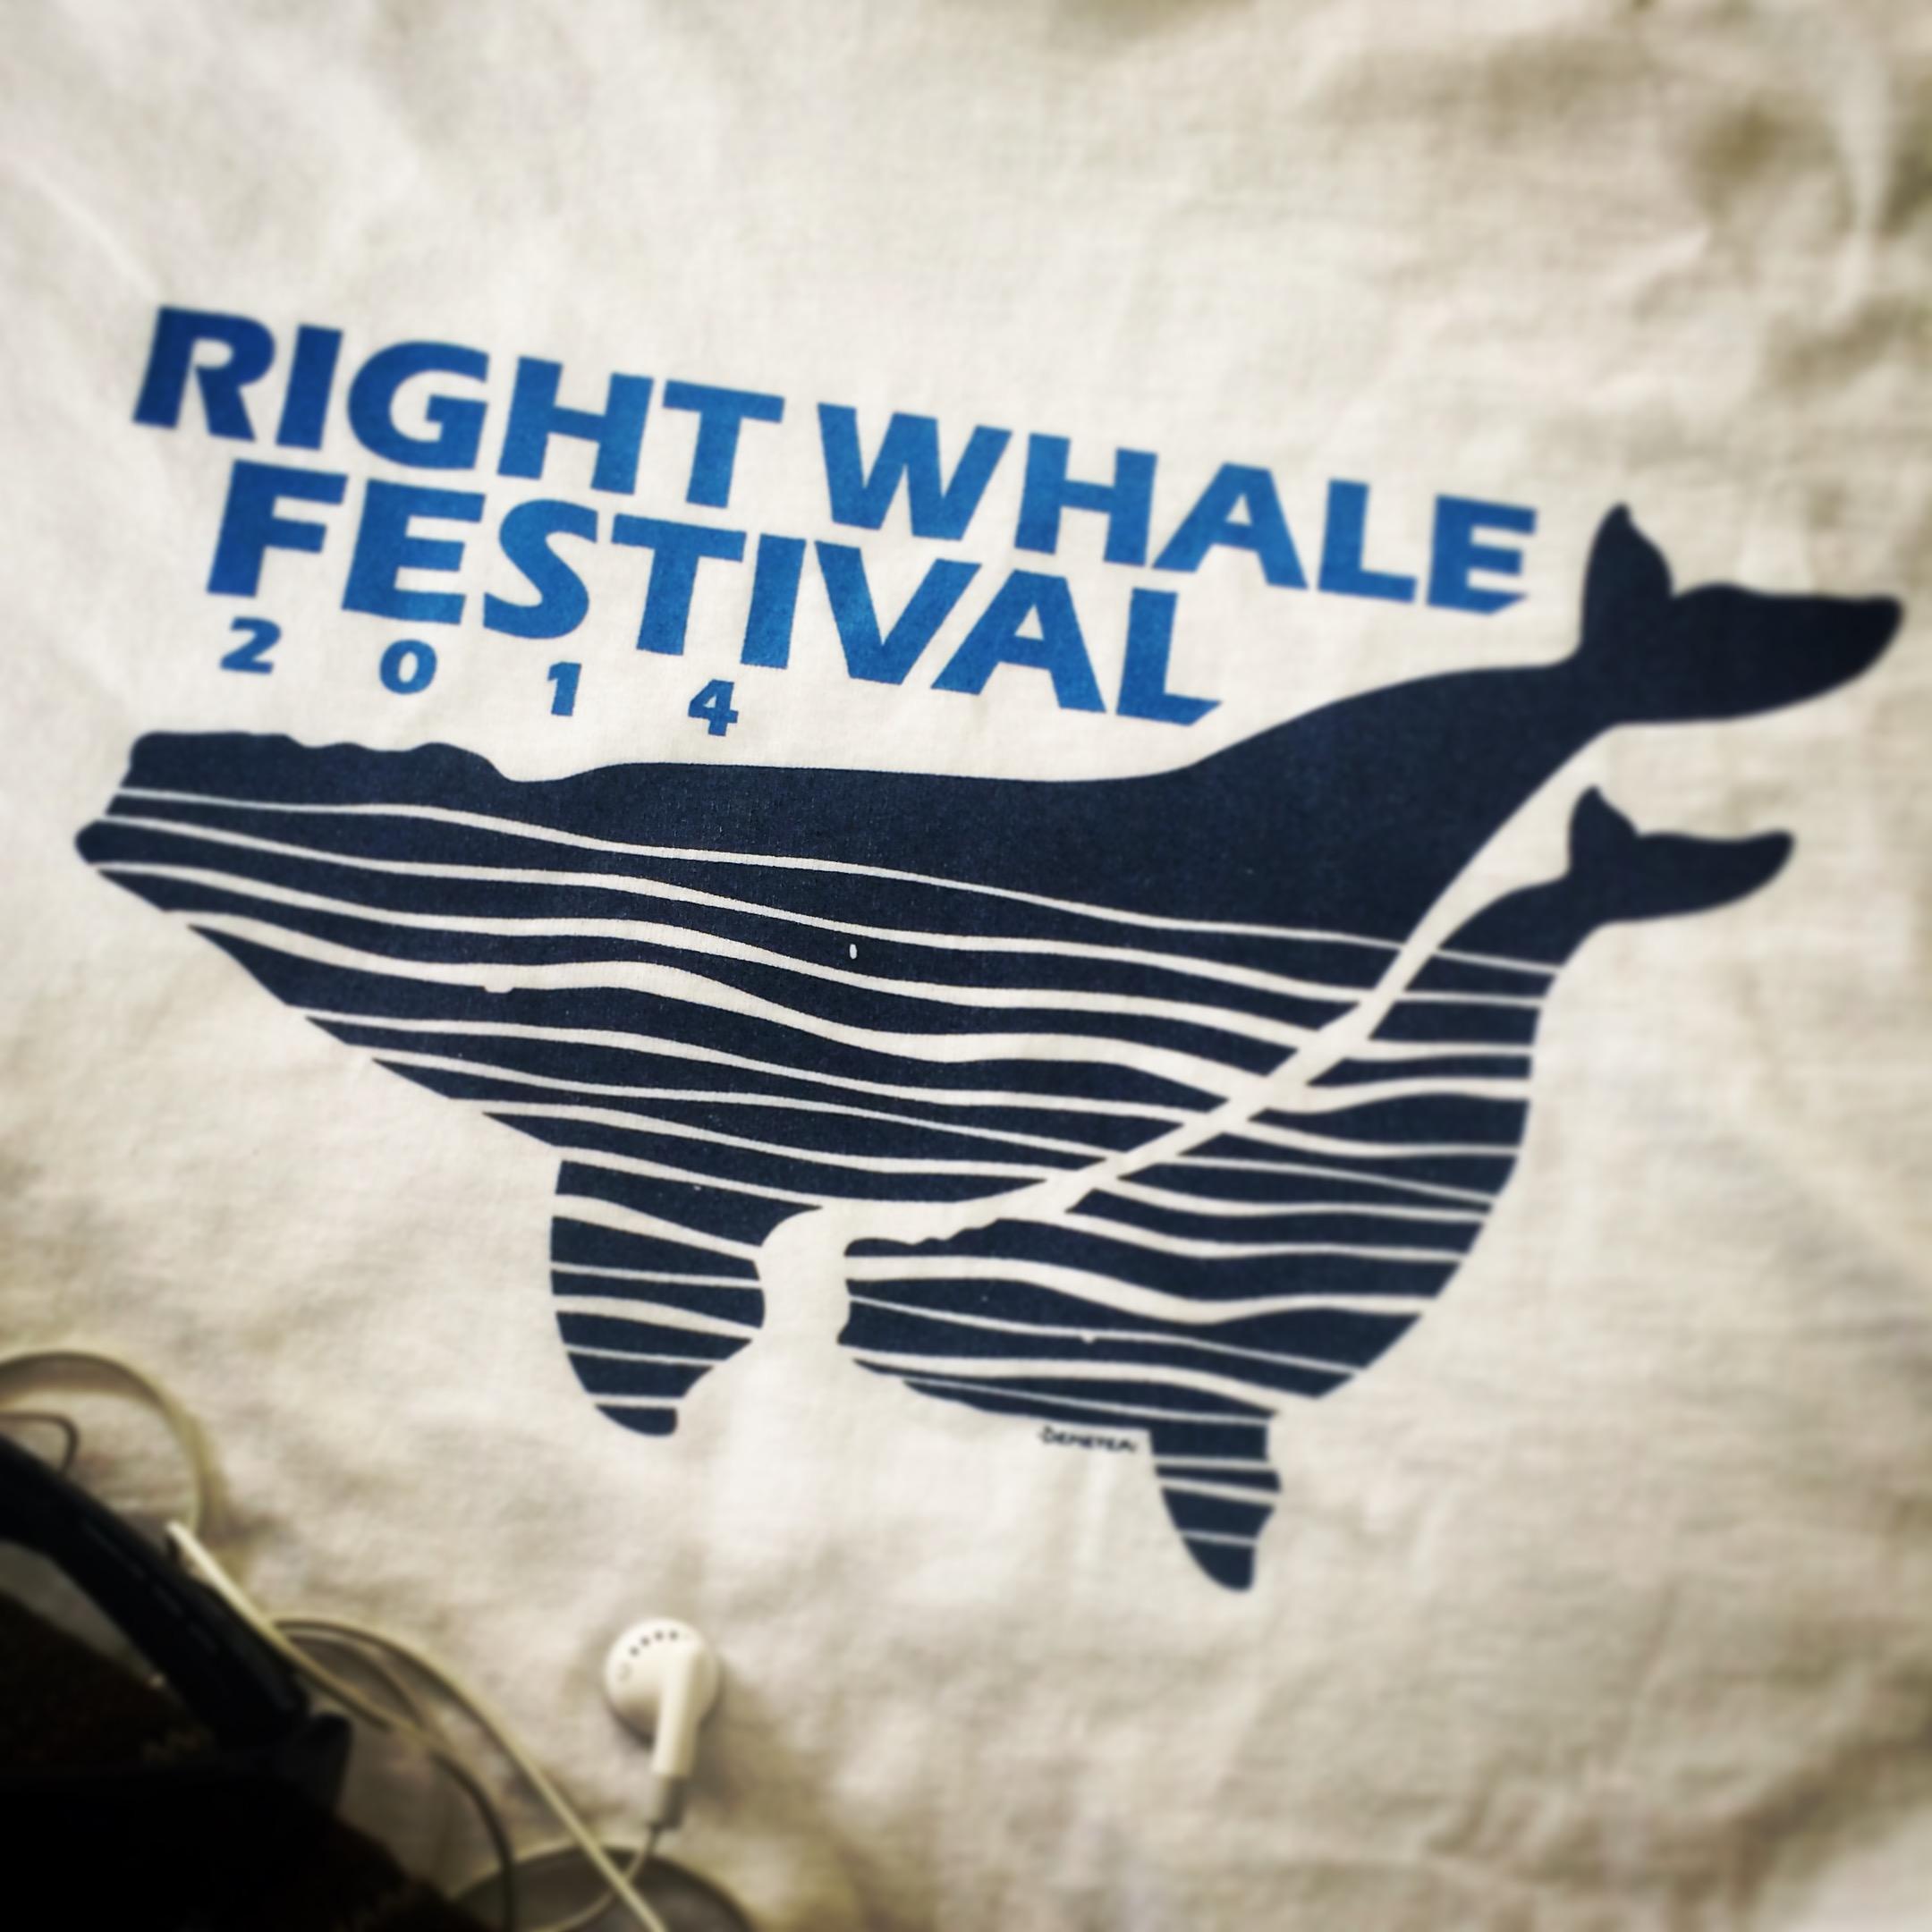 Right Whale Festival 2014 t-shirt artwork